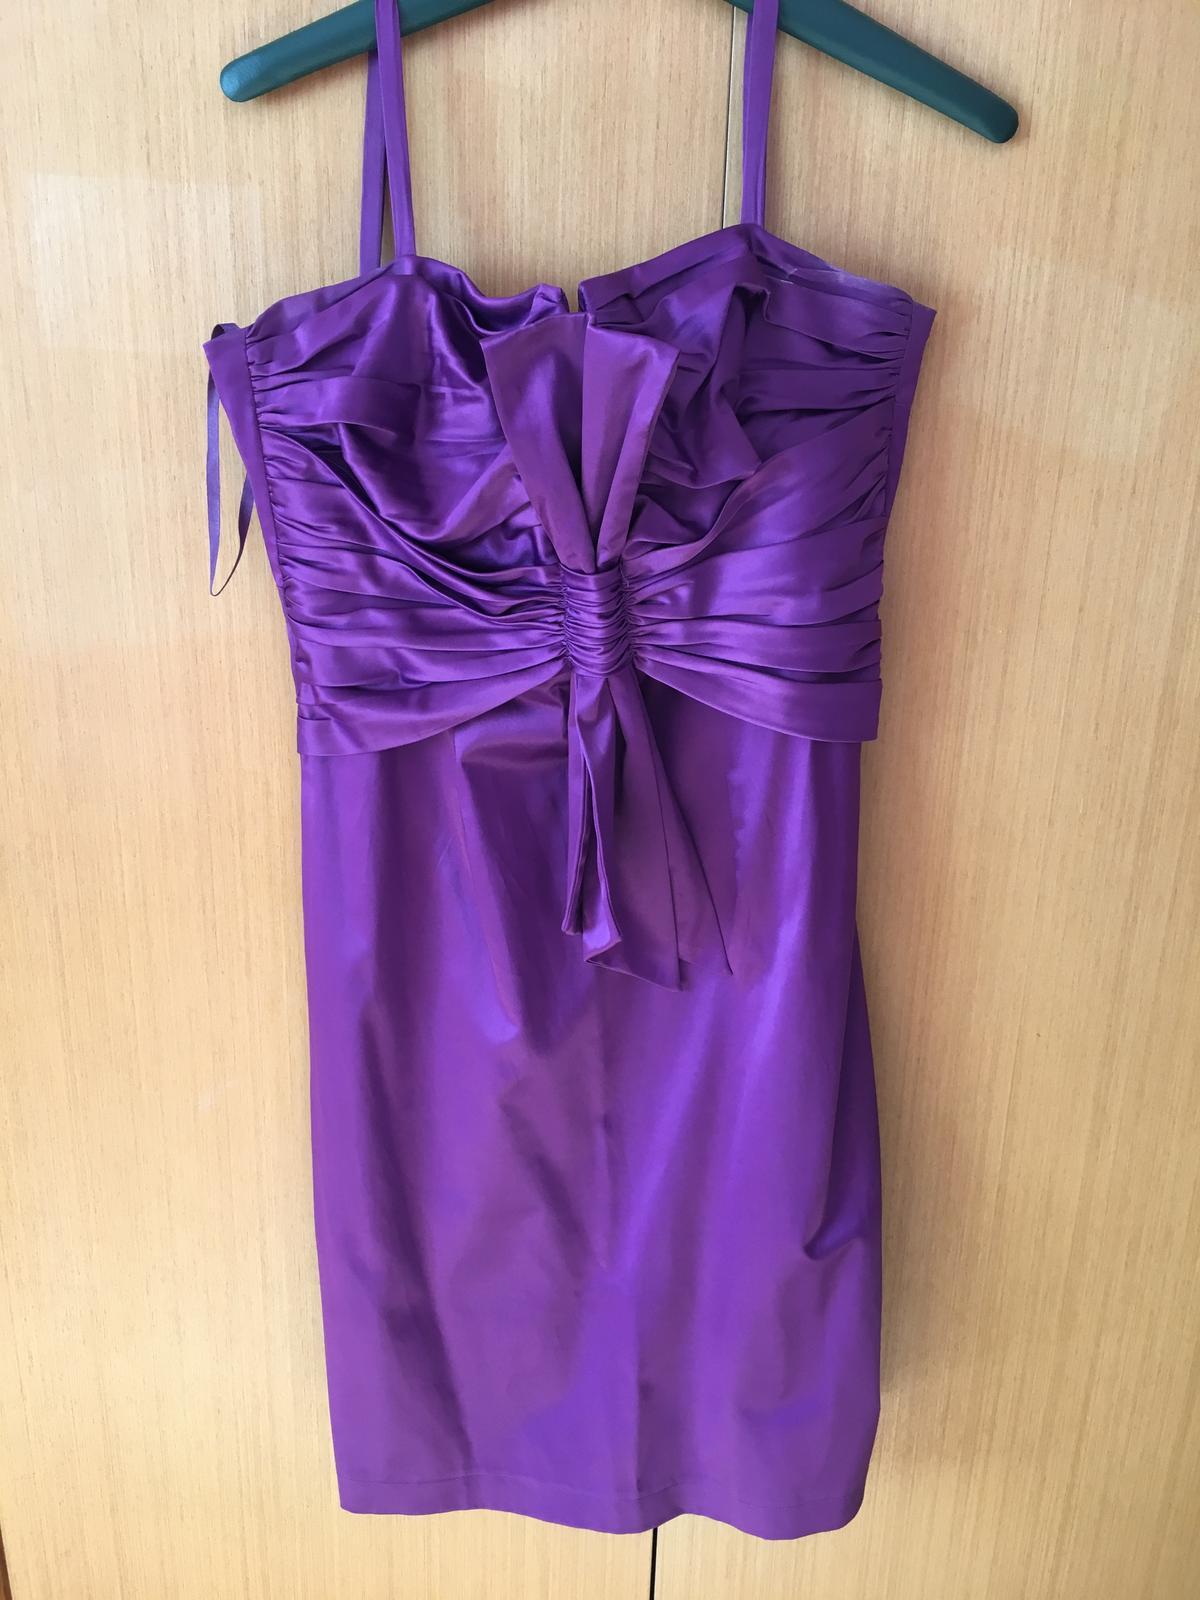 a58b05ebe120 Spoločenské fialove krátke šaty